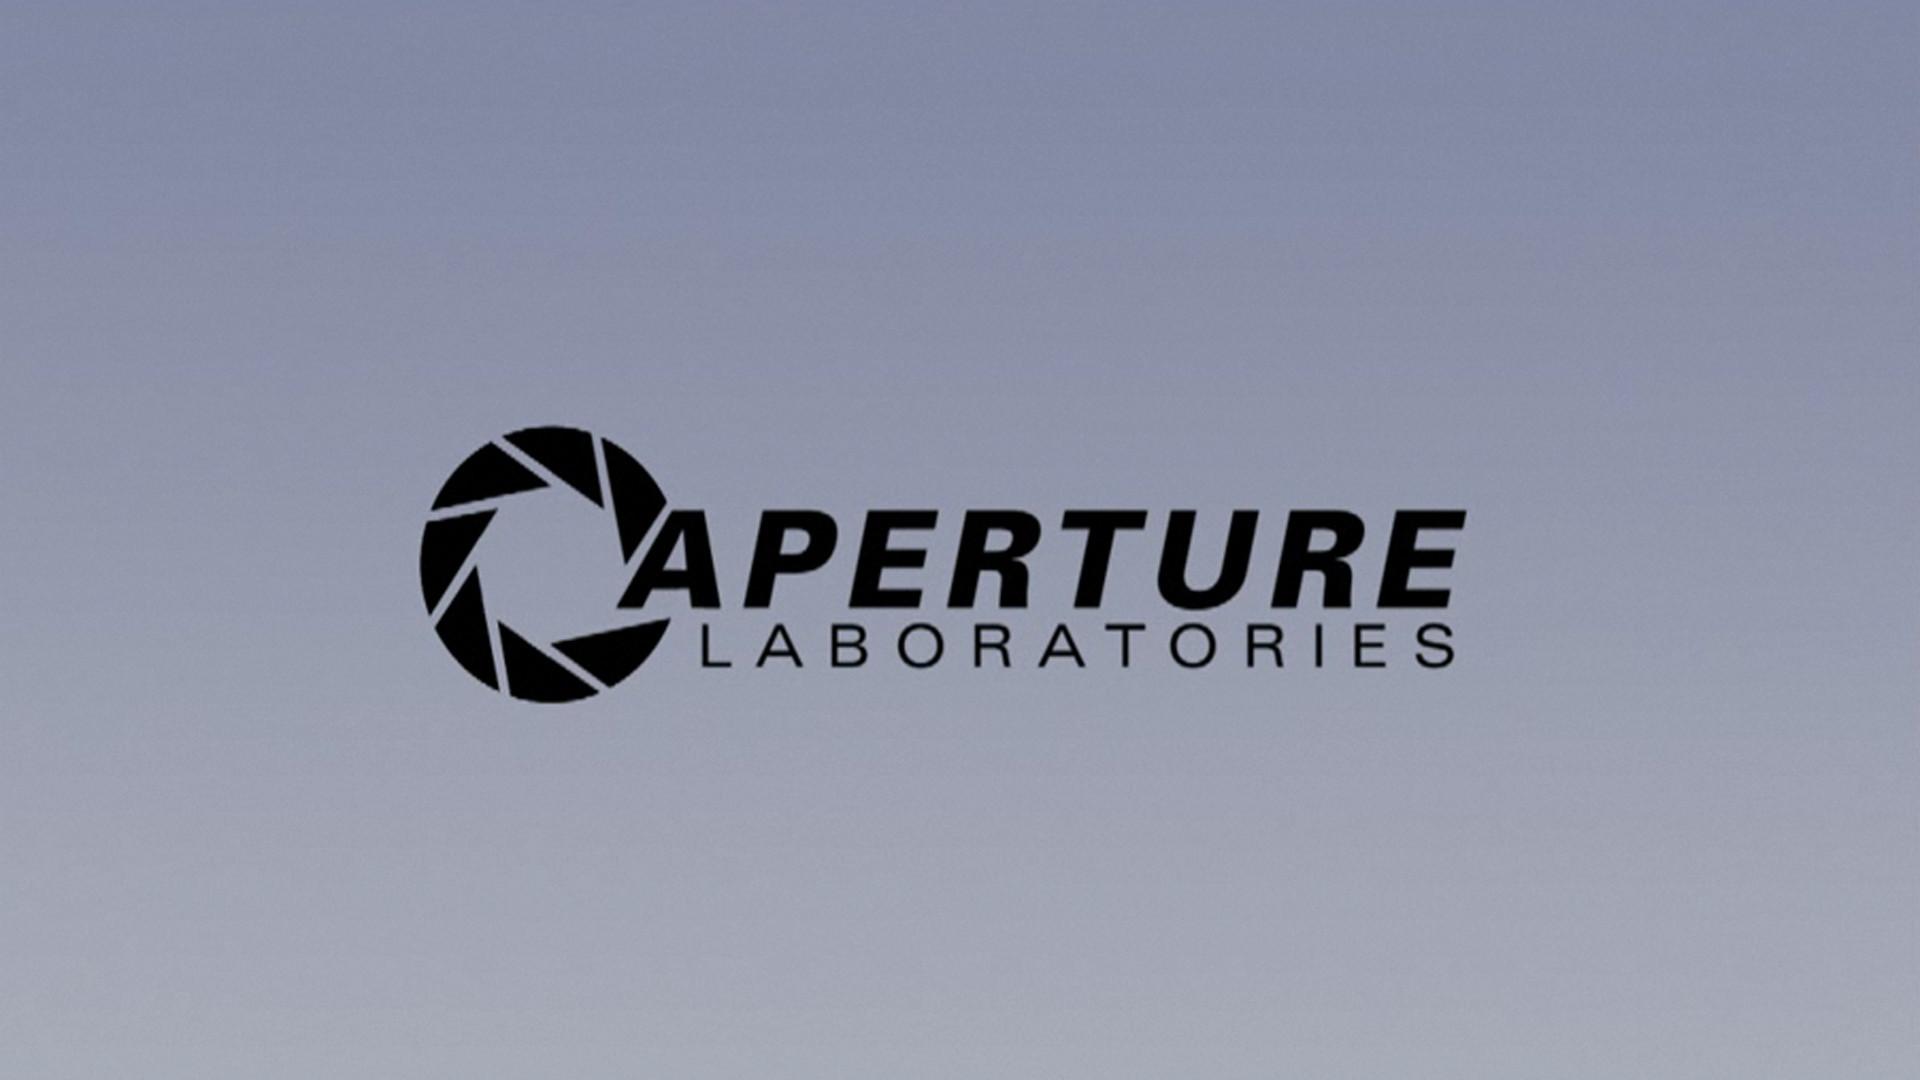 wallpaper, portal, background, wallpapaer, laboratories, aperture .